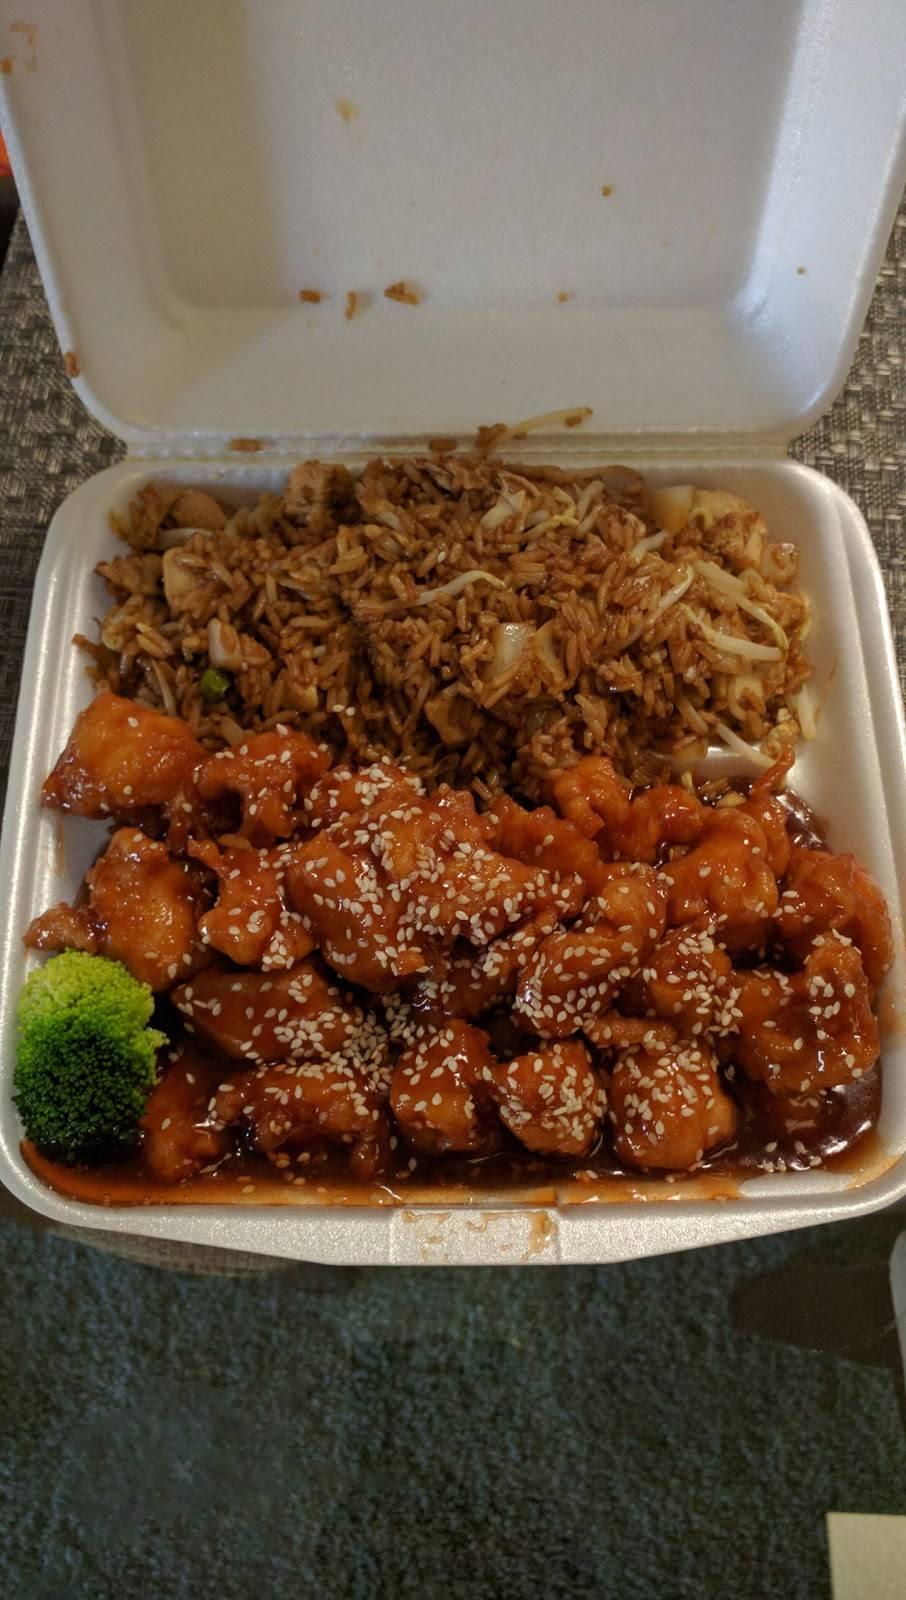 Lees Kitchen | restaurant | 12000 TX-1604 Loop #120, Universal City, TX 78148, USA | 2106586888 OR +1 210-658-6888